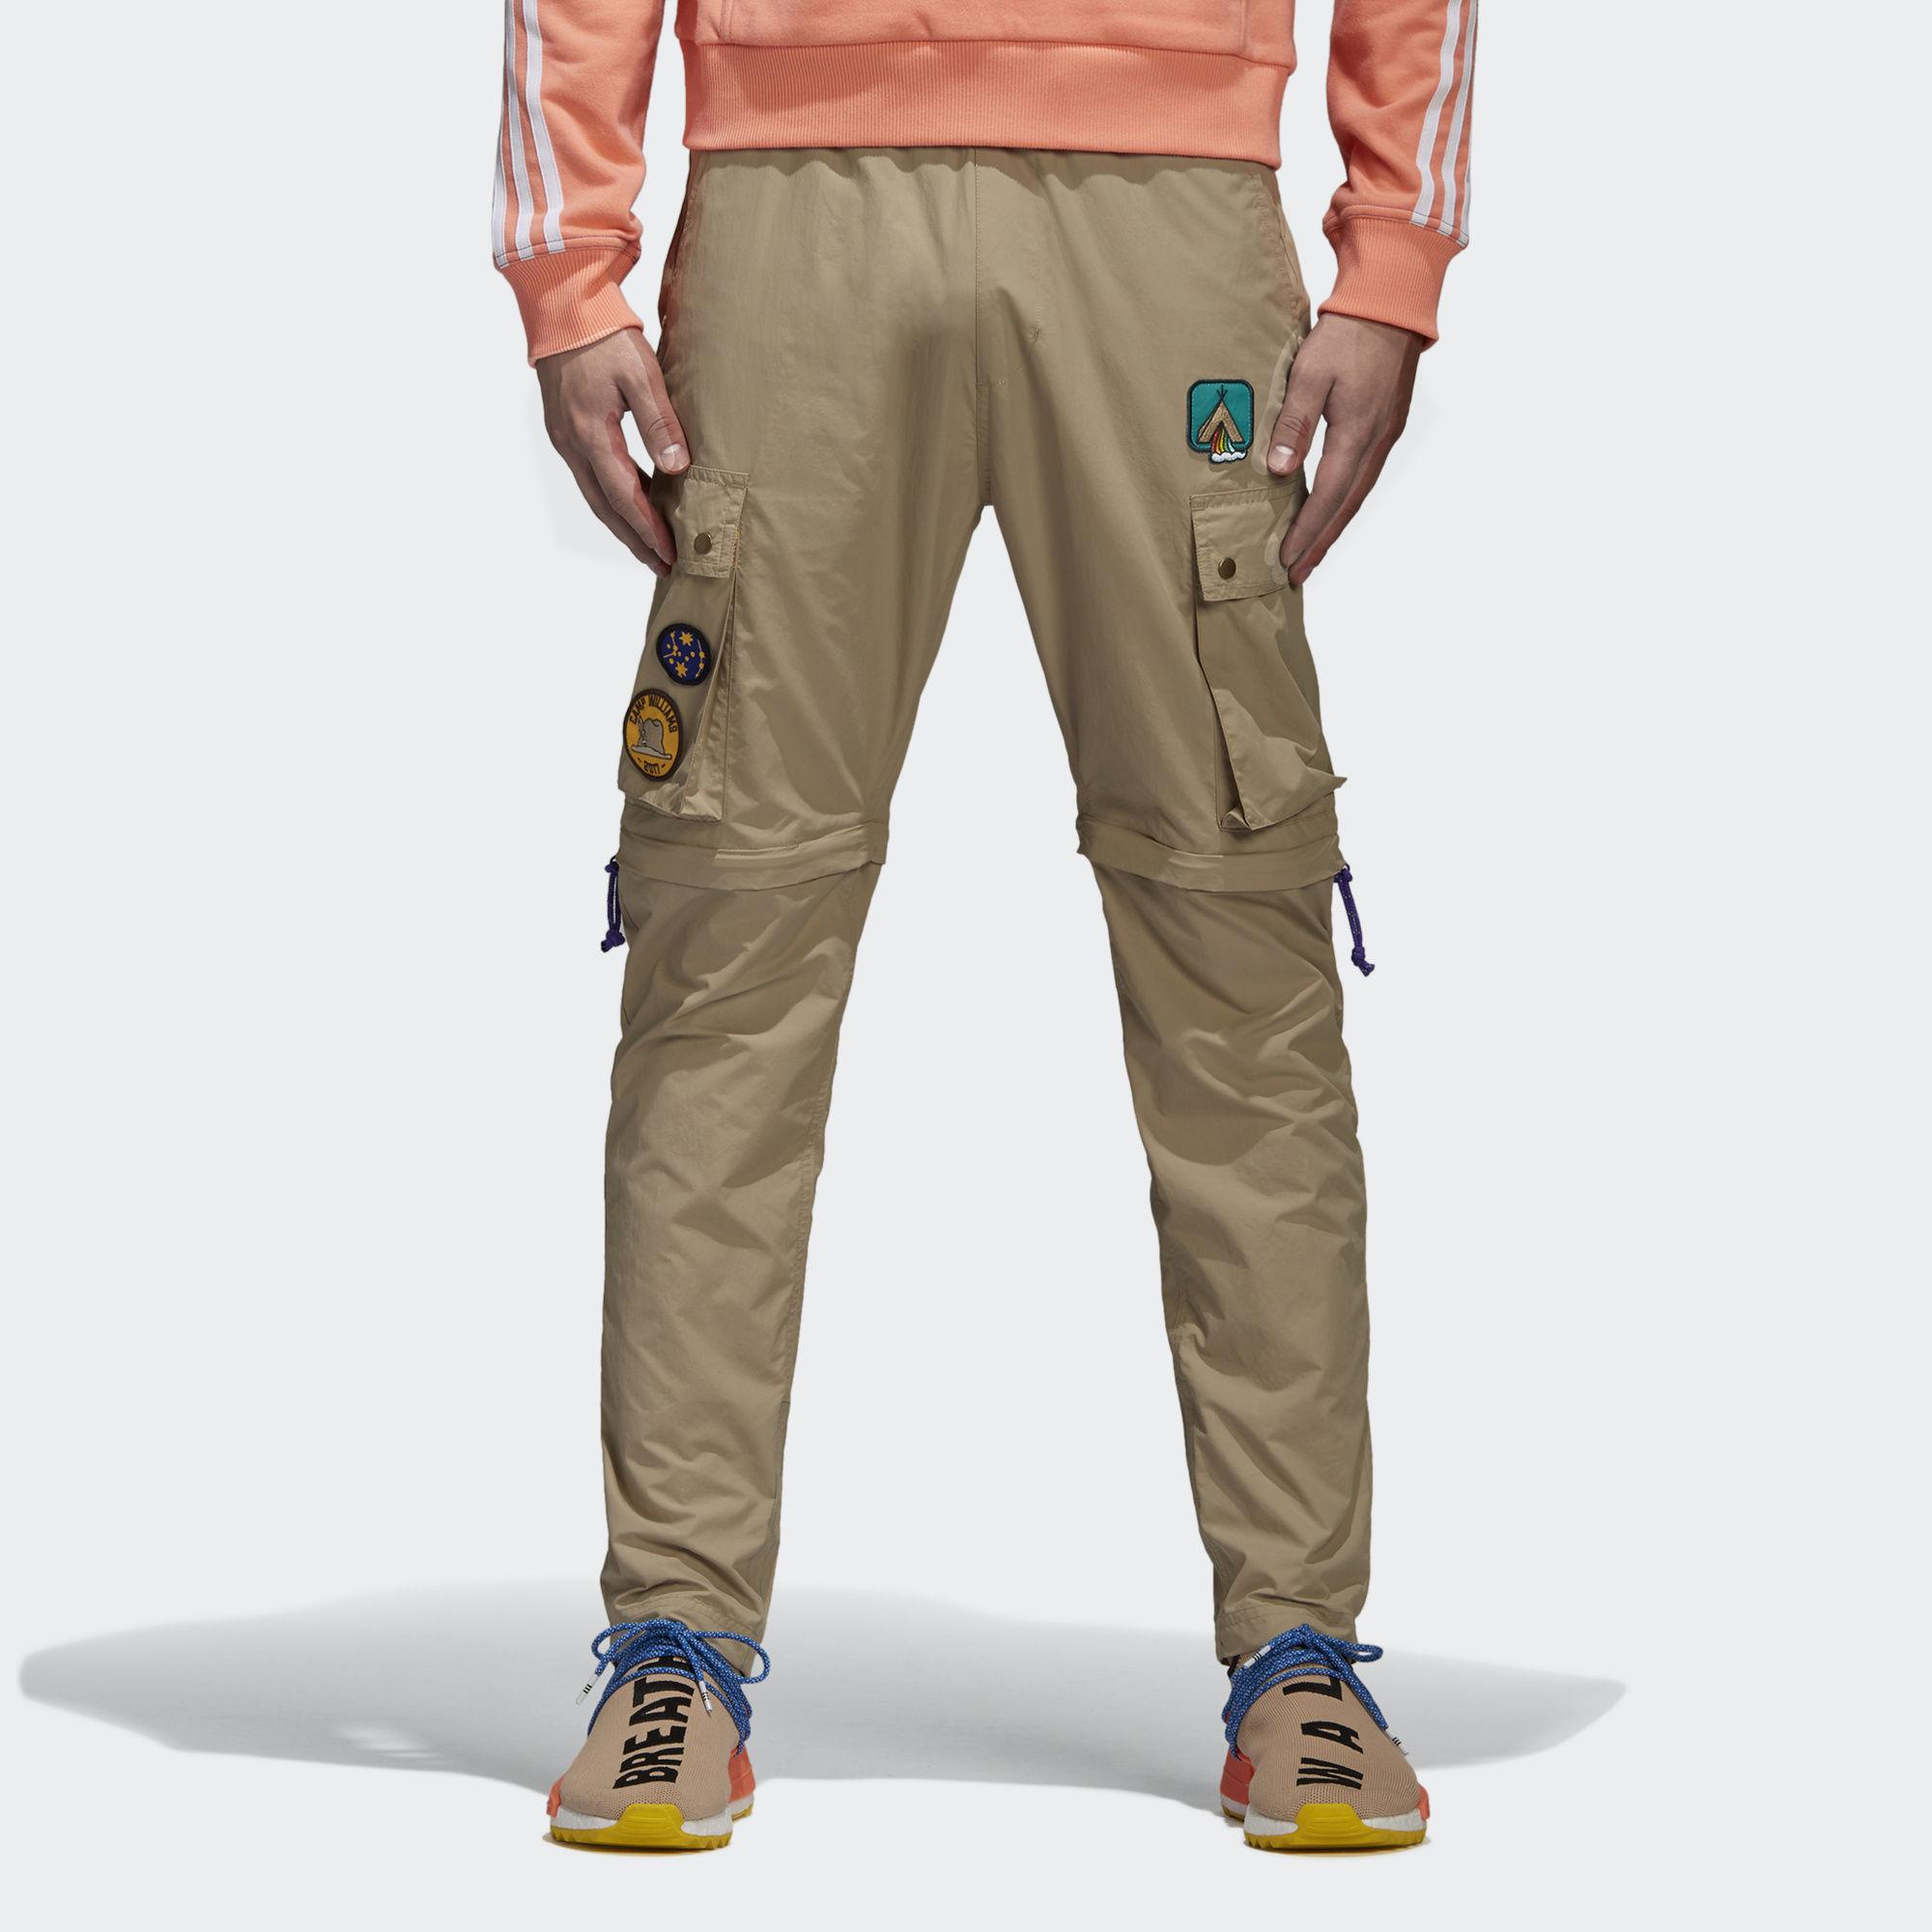 04d03a9e5ad92 Adidas × Pharrell ×. Pharrel Williams Hu Hiking ...